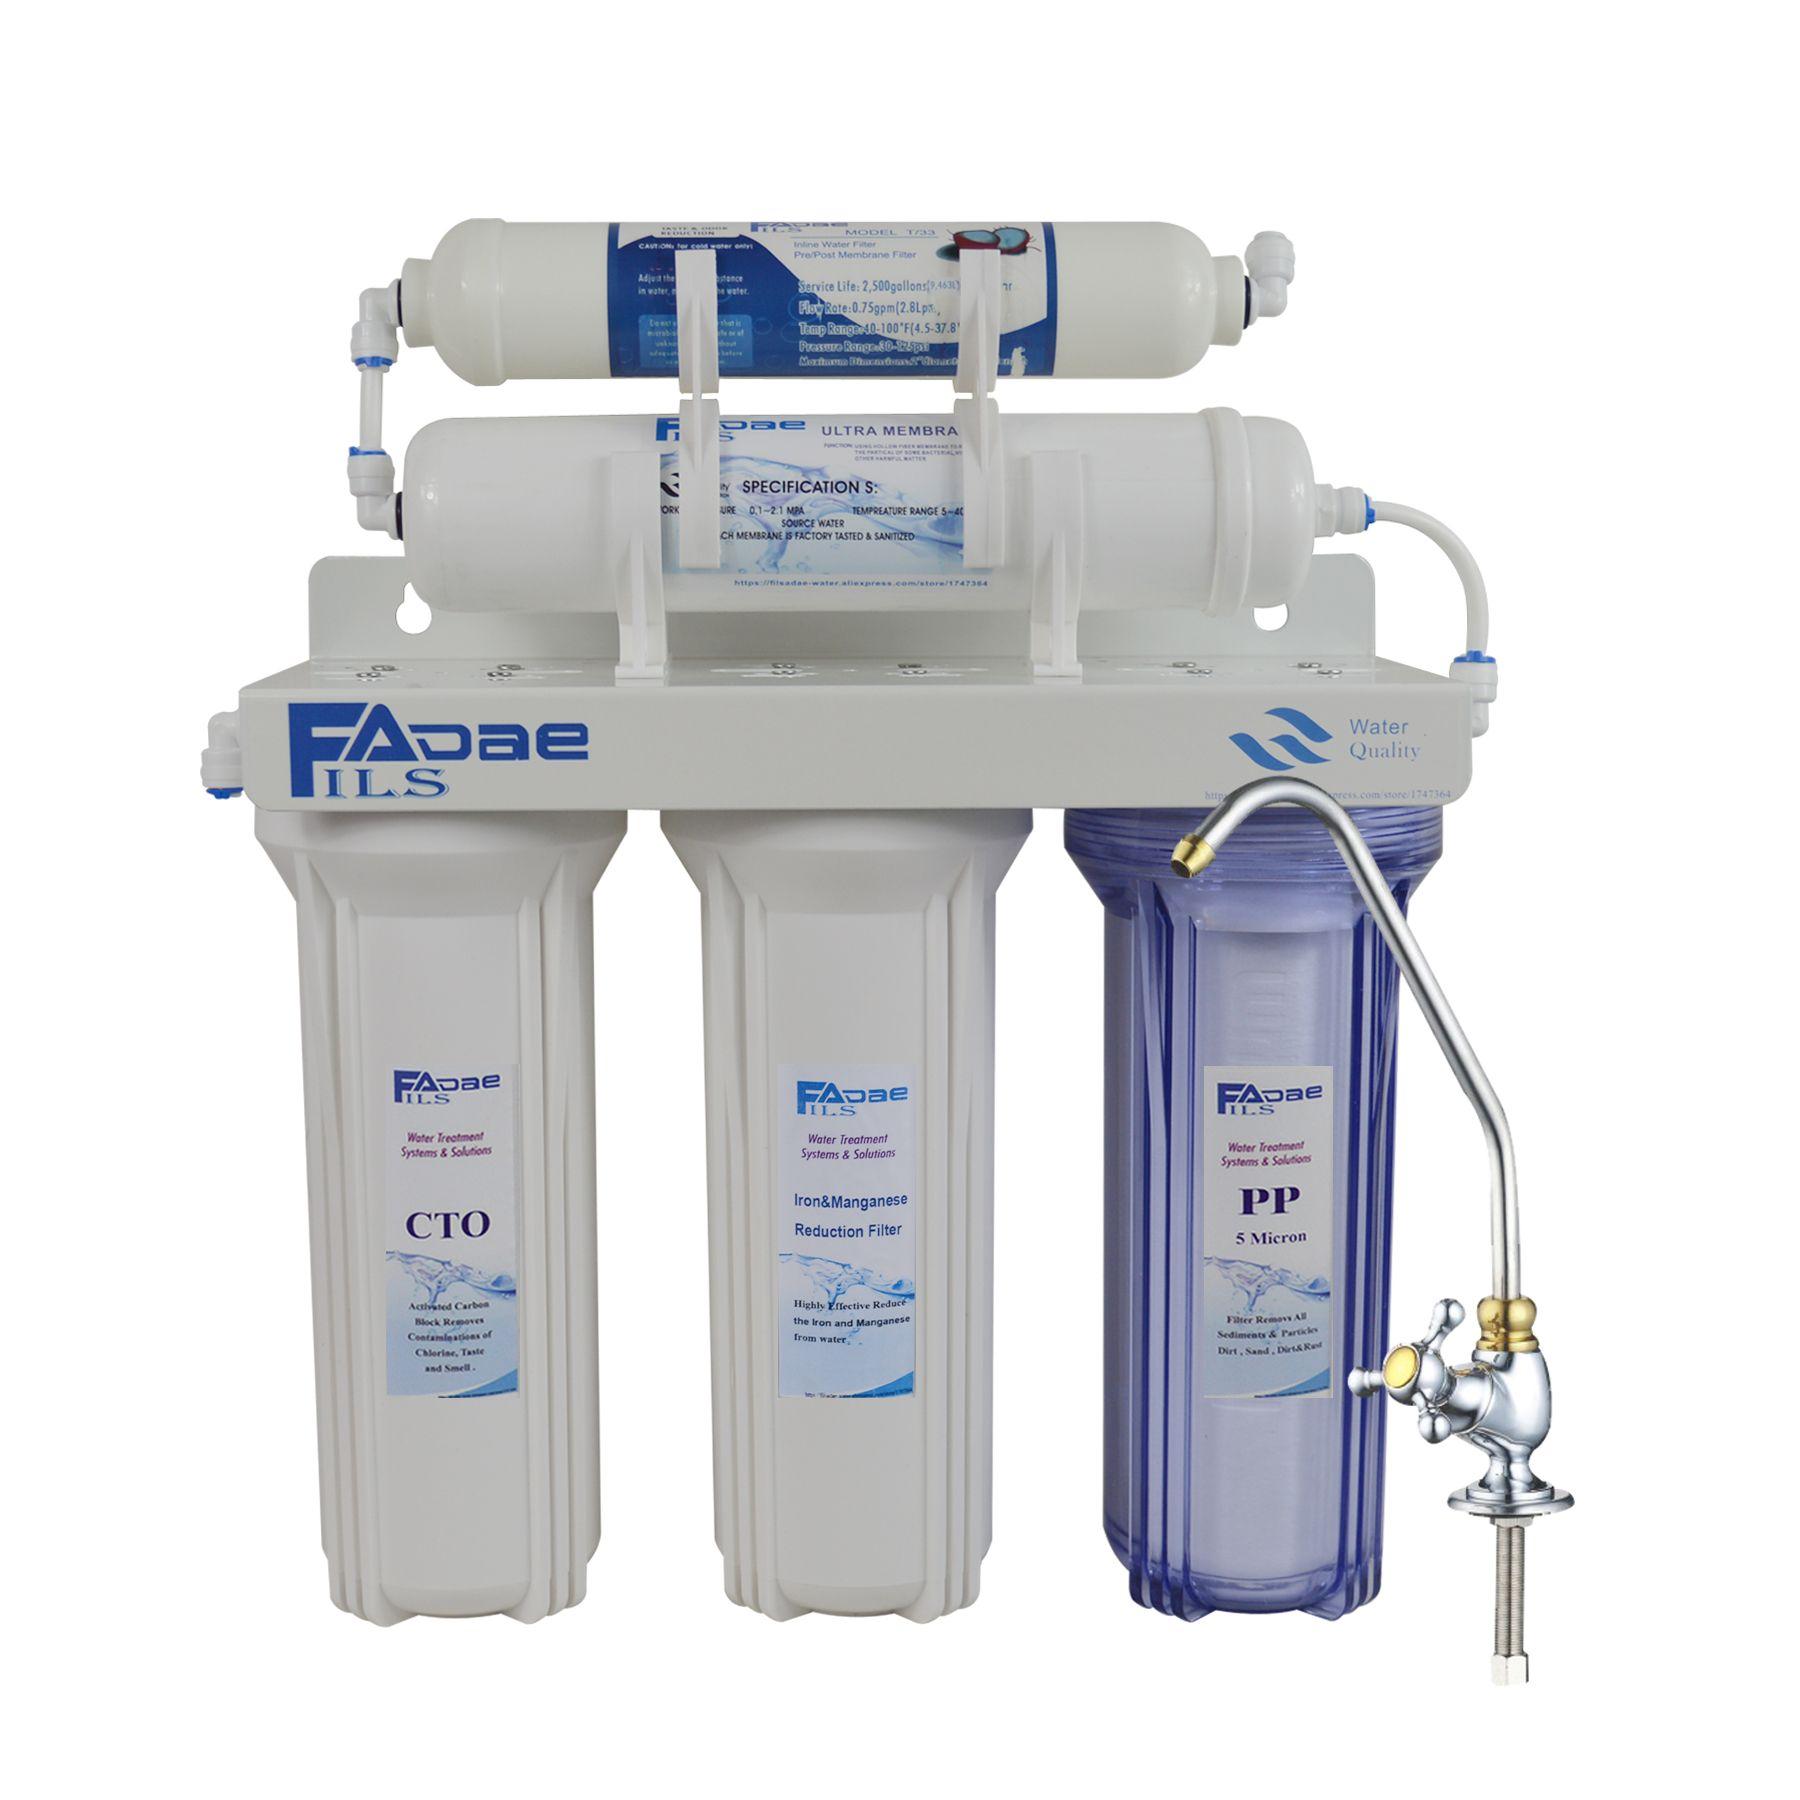 Pin by FILSADAE WATERTEC on UnderSink Water Filtration